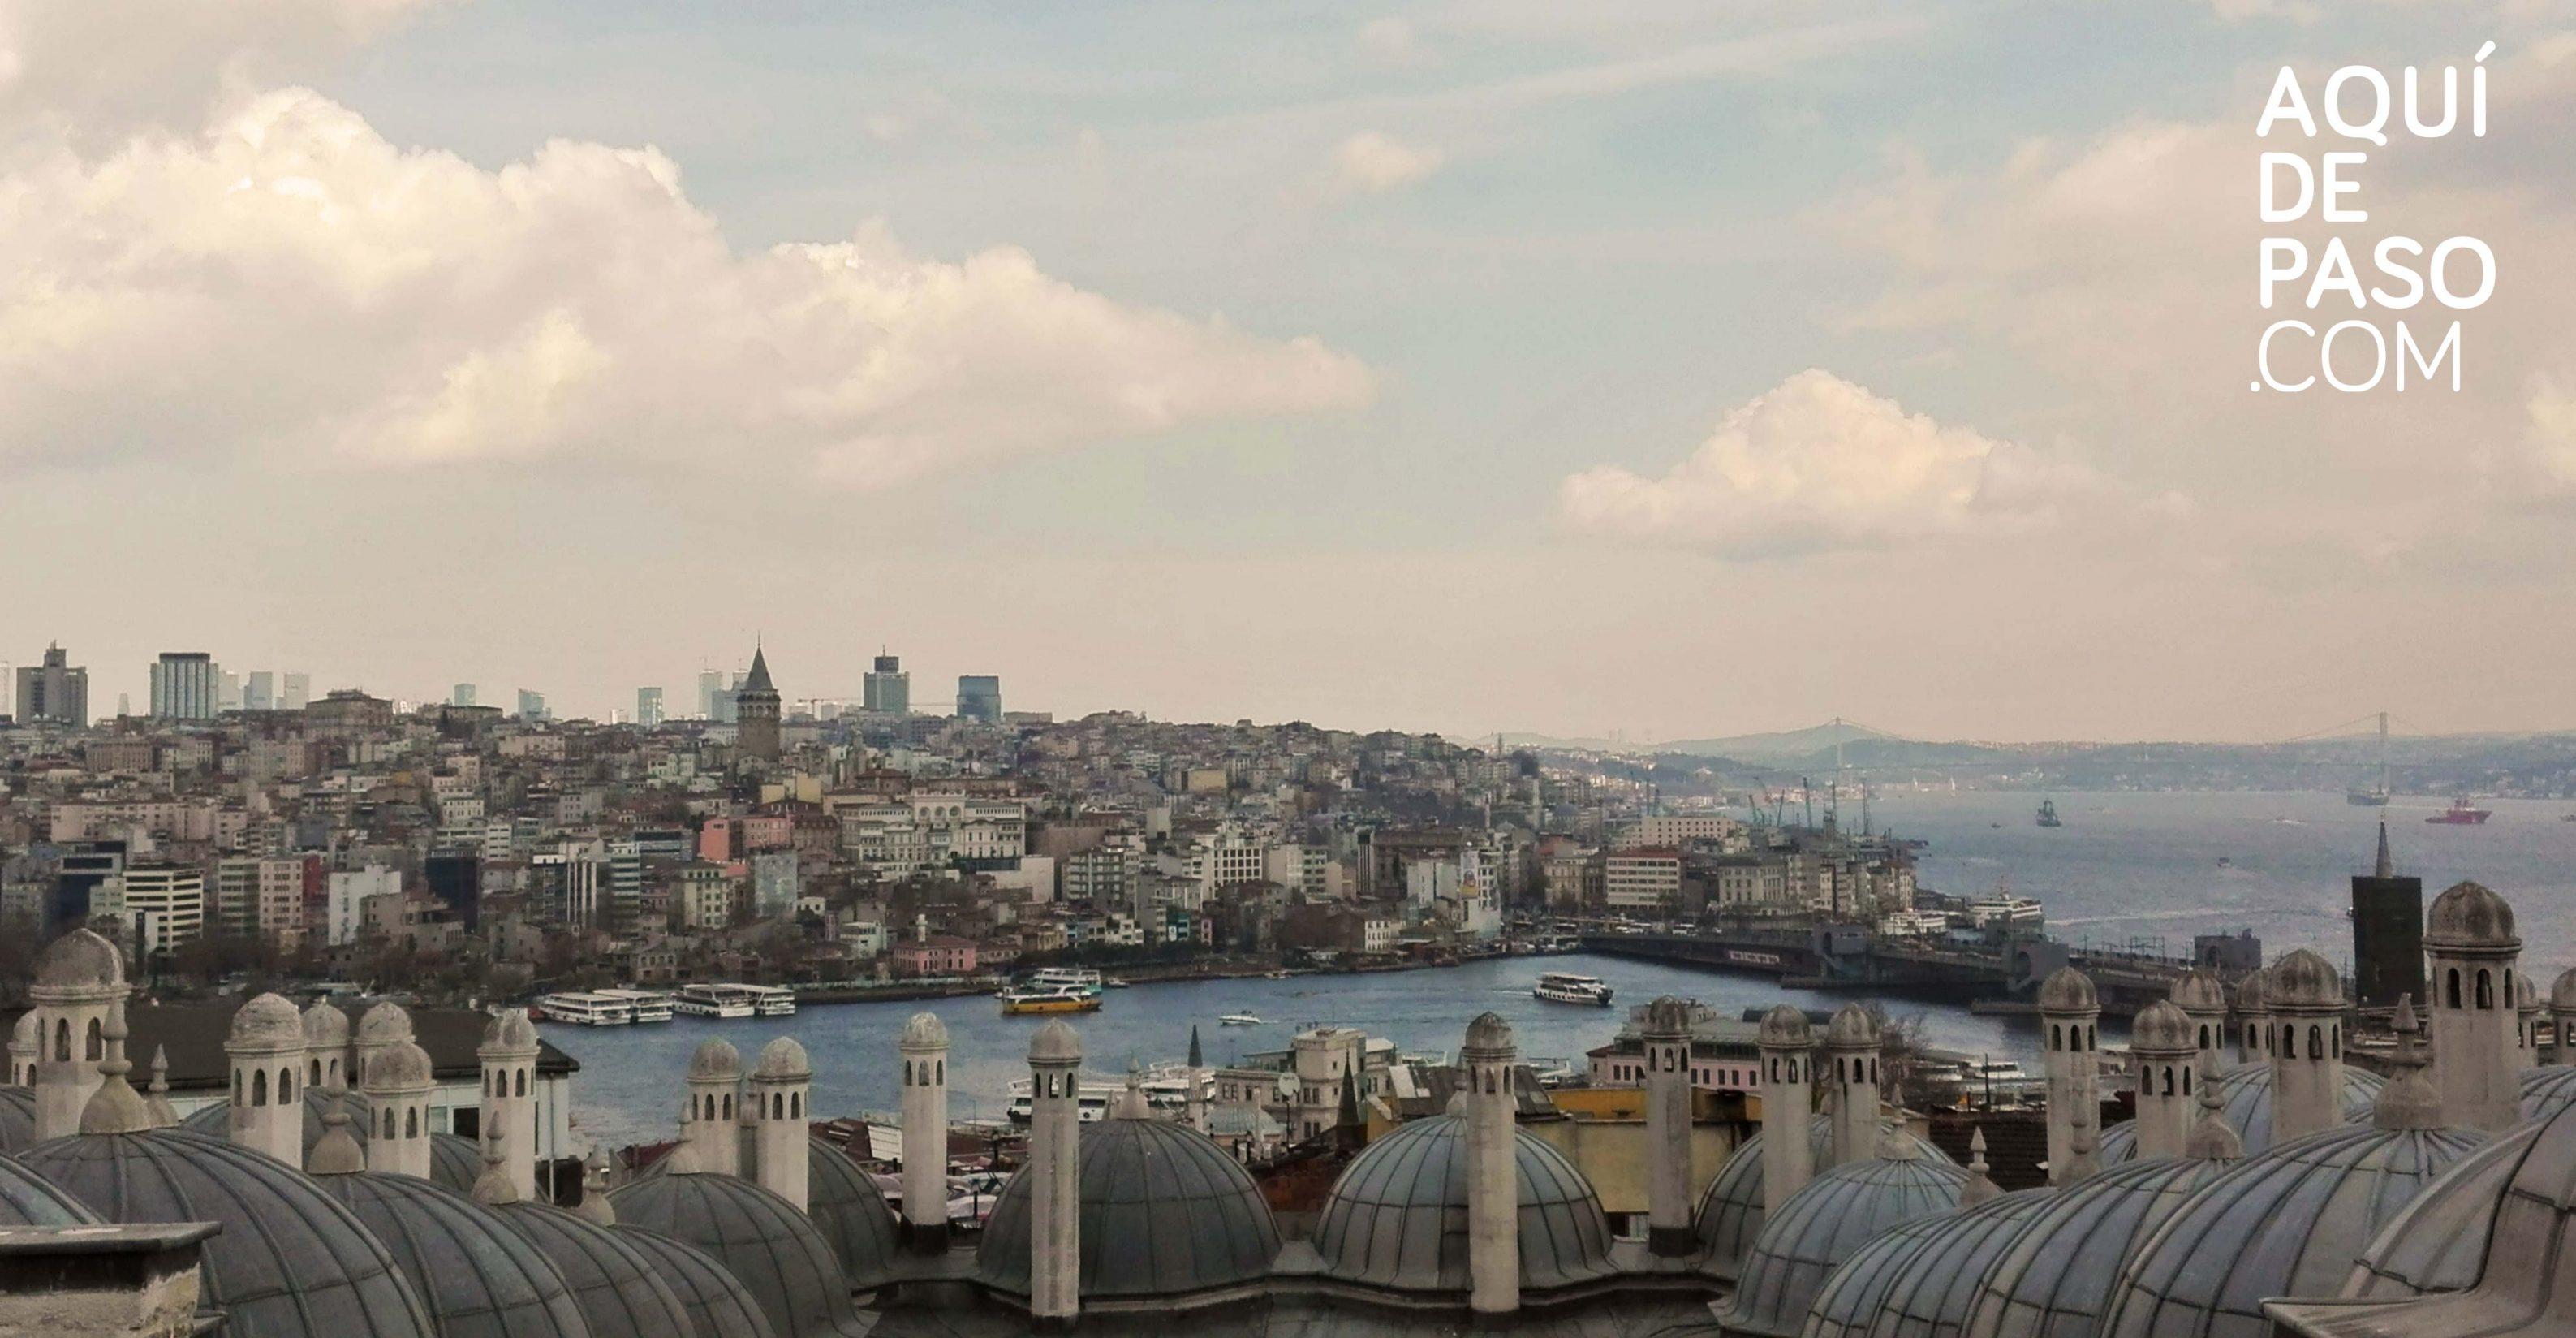 Estambul from the top - Aquidepaso.com